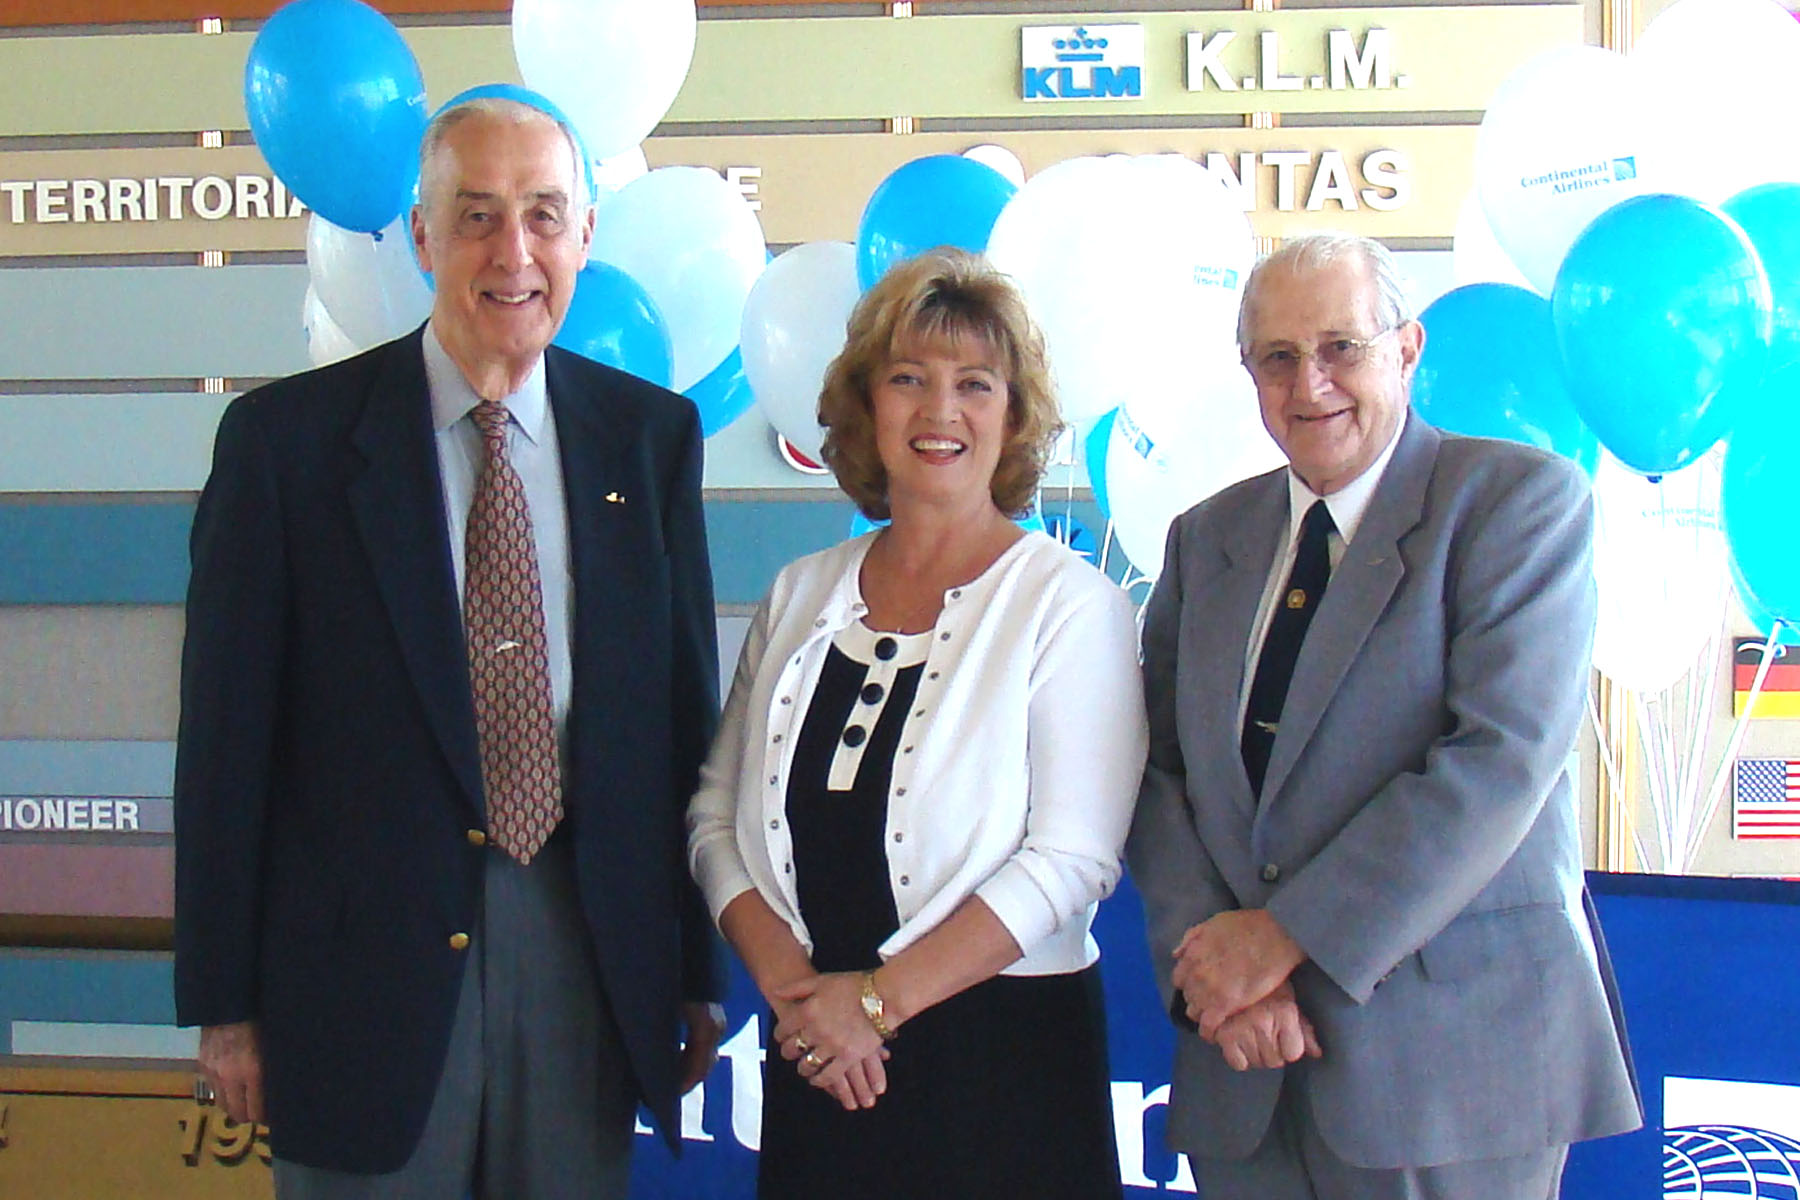 Dick Newton, Colleen Picard & Col. Joe Bullers @ SPMOH - 2, 27 Mar '08.jpg